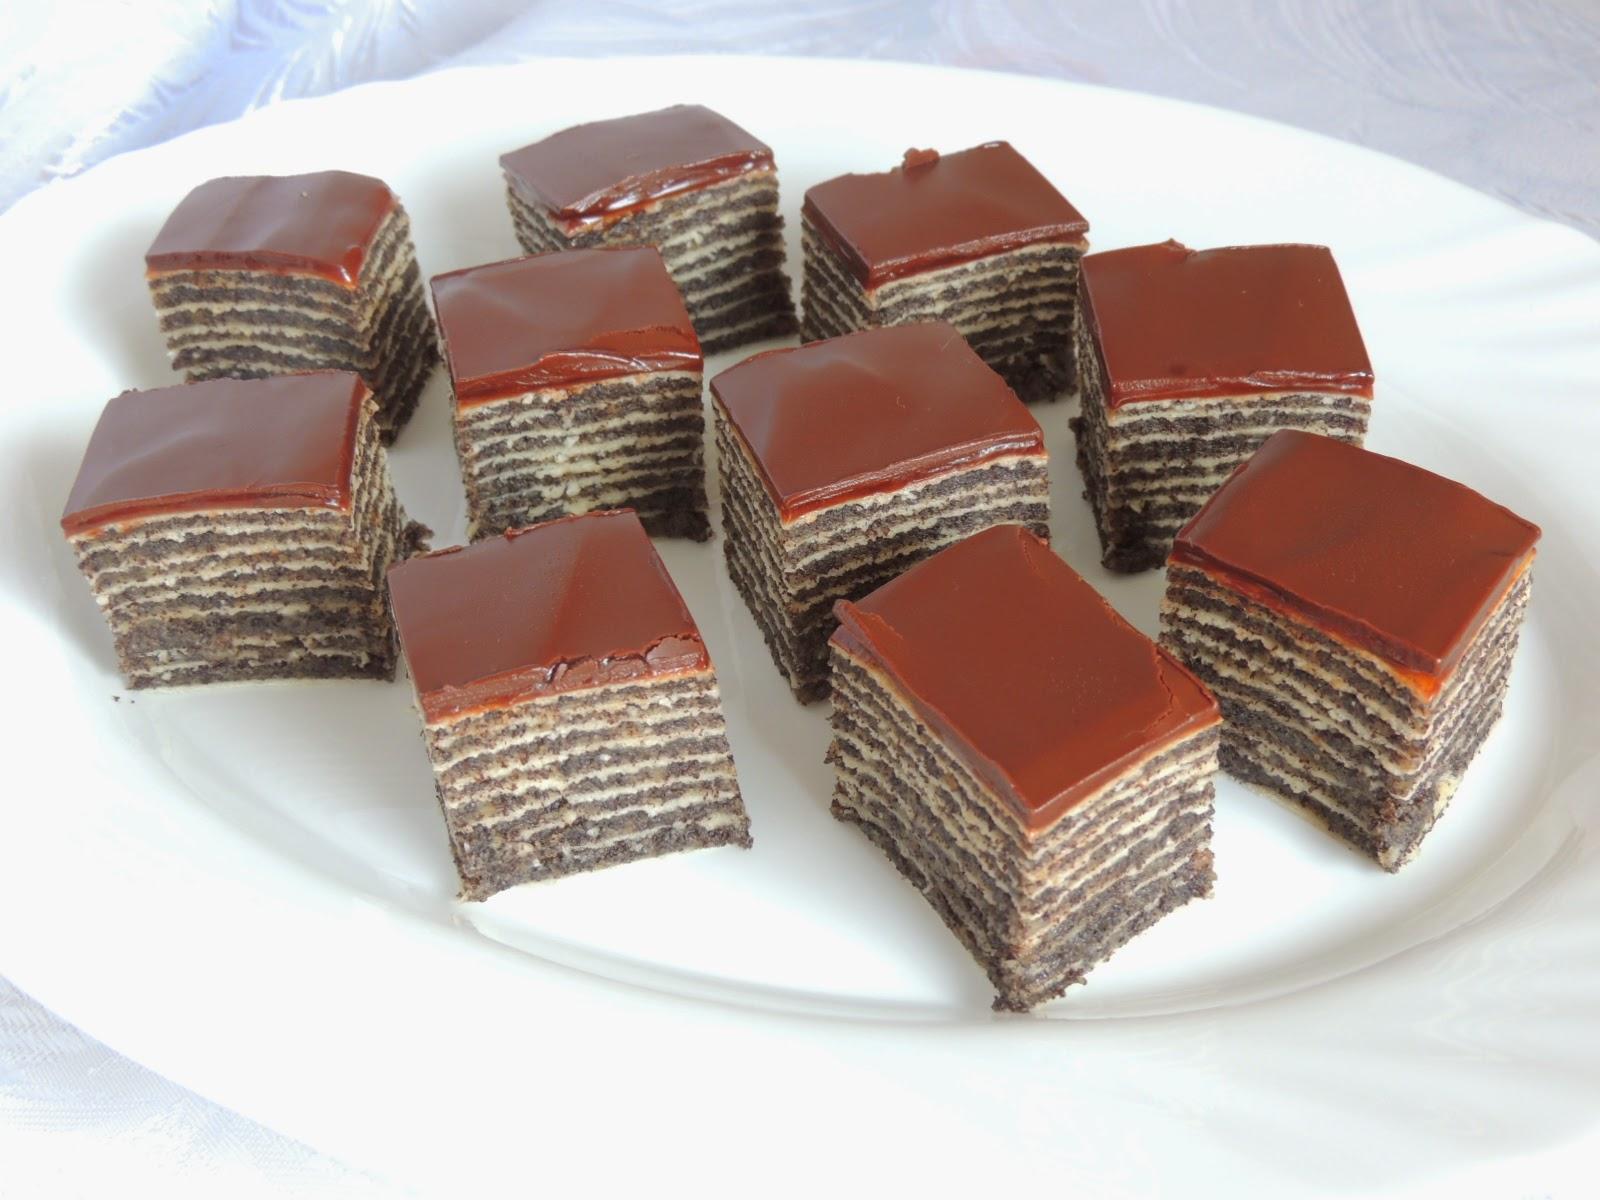 Chocolate cake with readymade barks